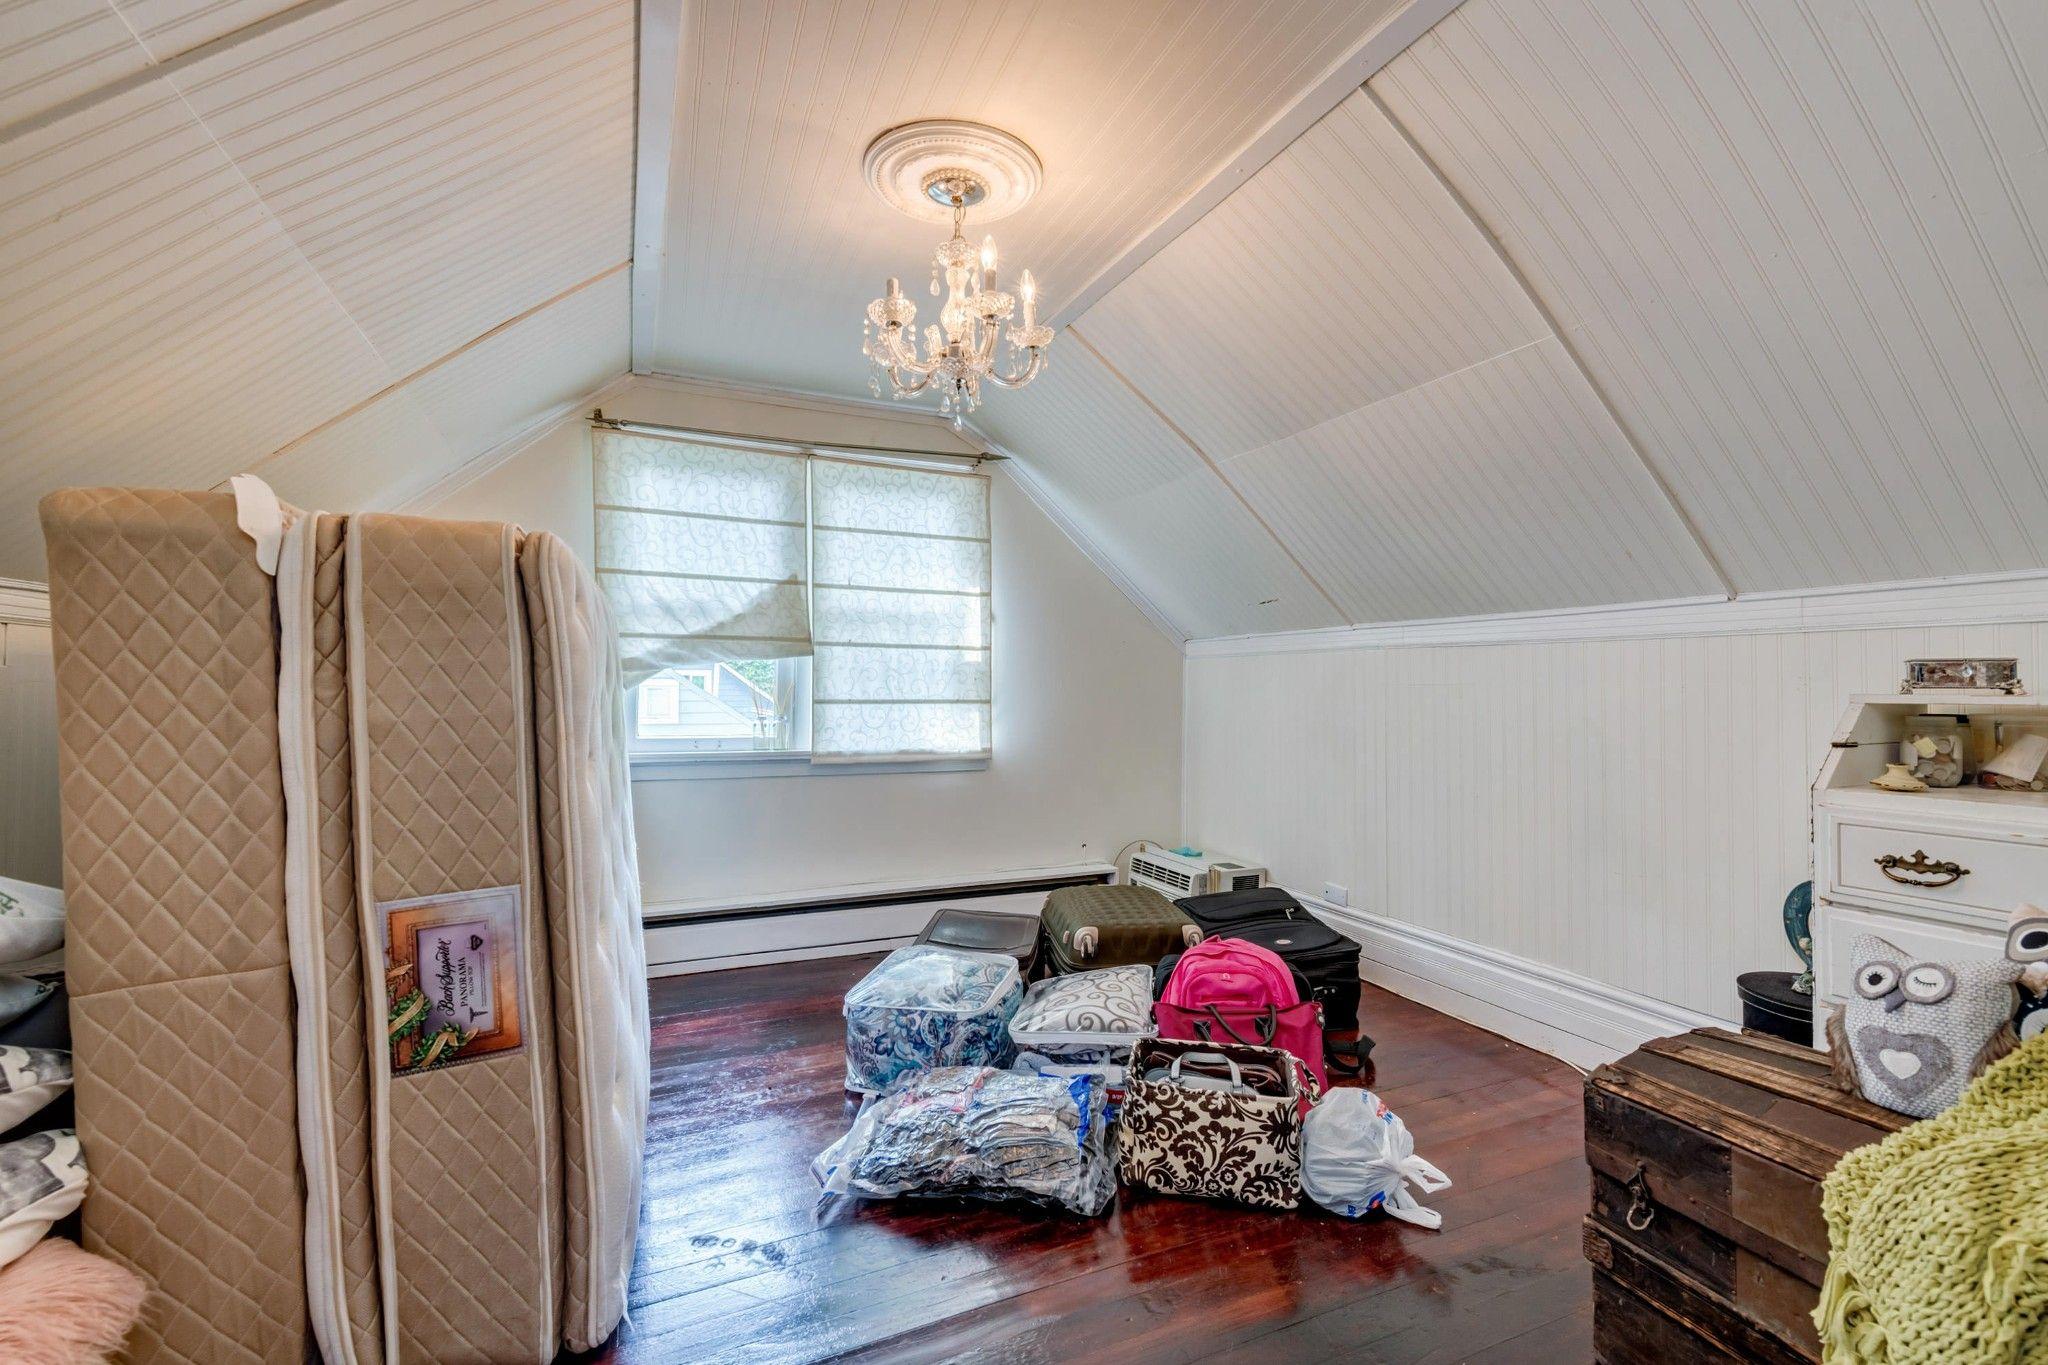 Photo 13: Photos: 20623 114 Avenue in Maple Ridge: Southwest Maple Ridge House for sale : MLS®# R2465656